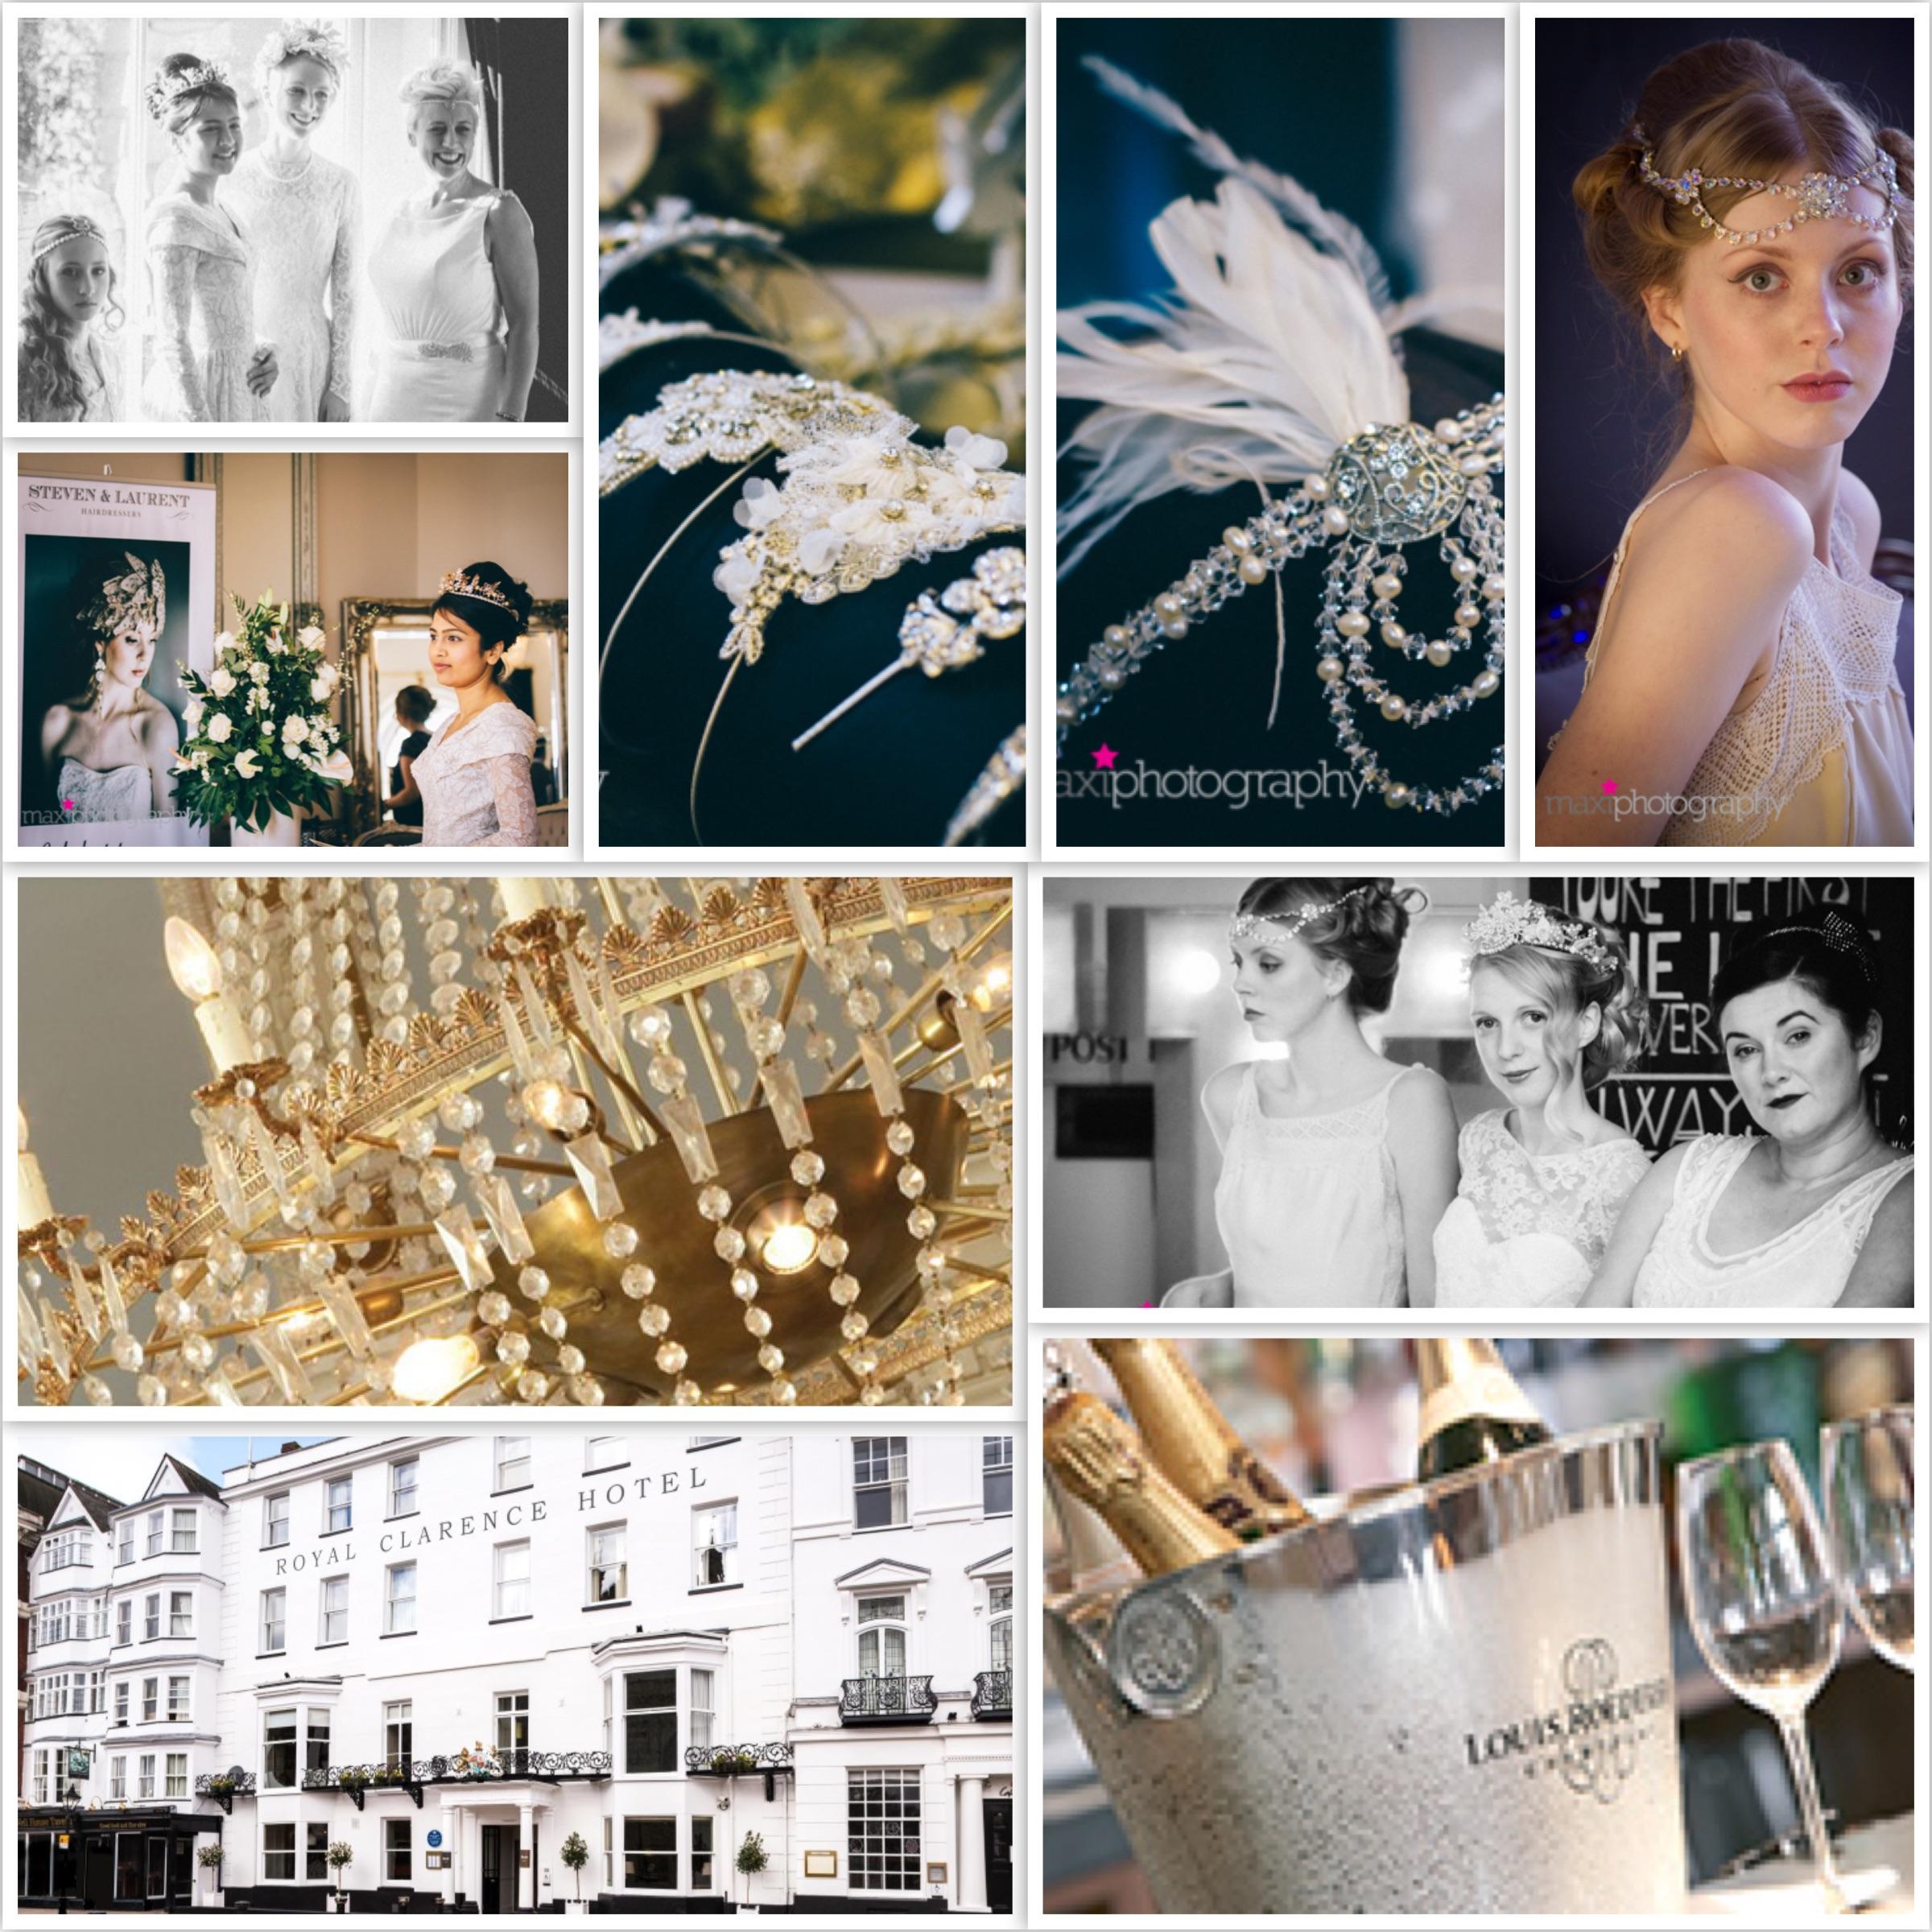 boutique and bijoux wed fair abode